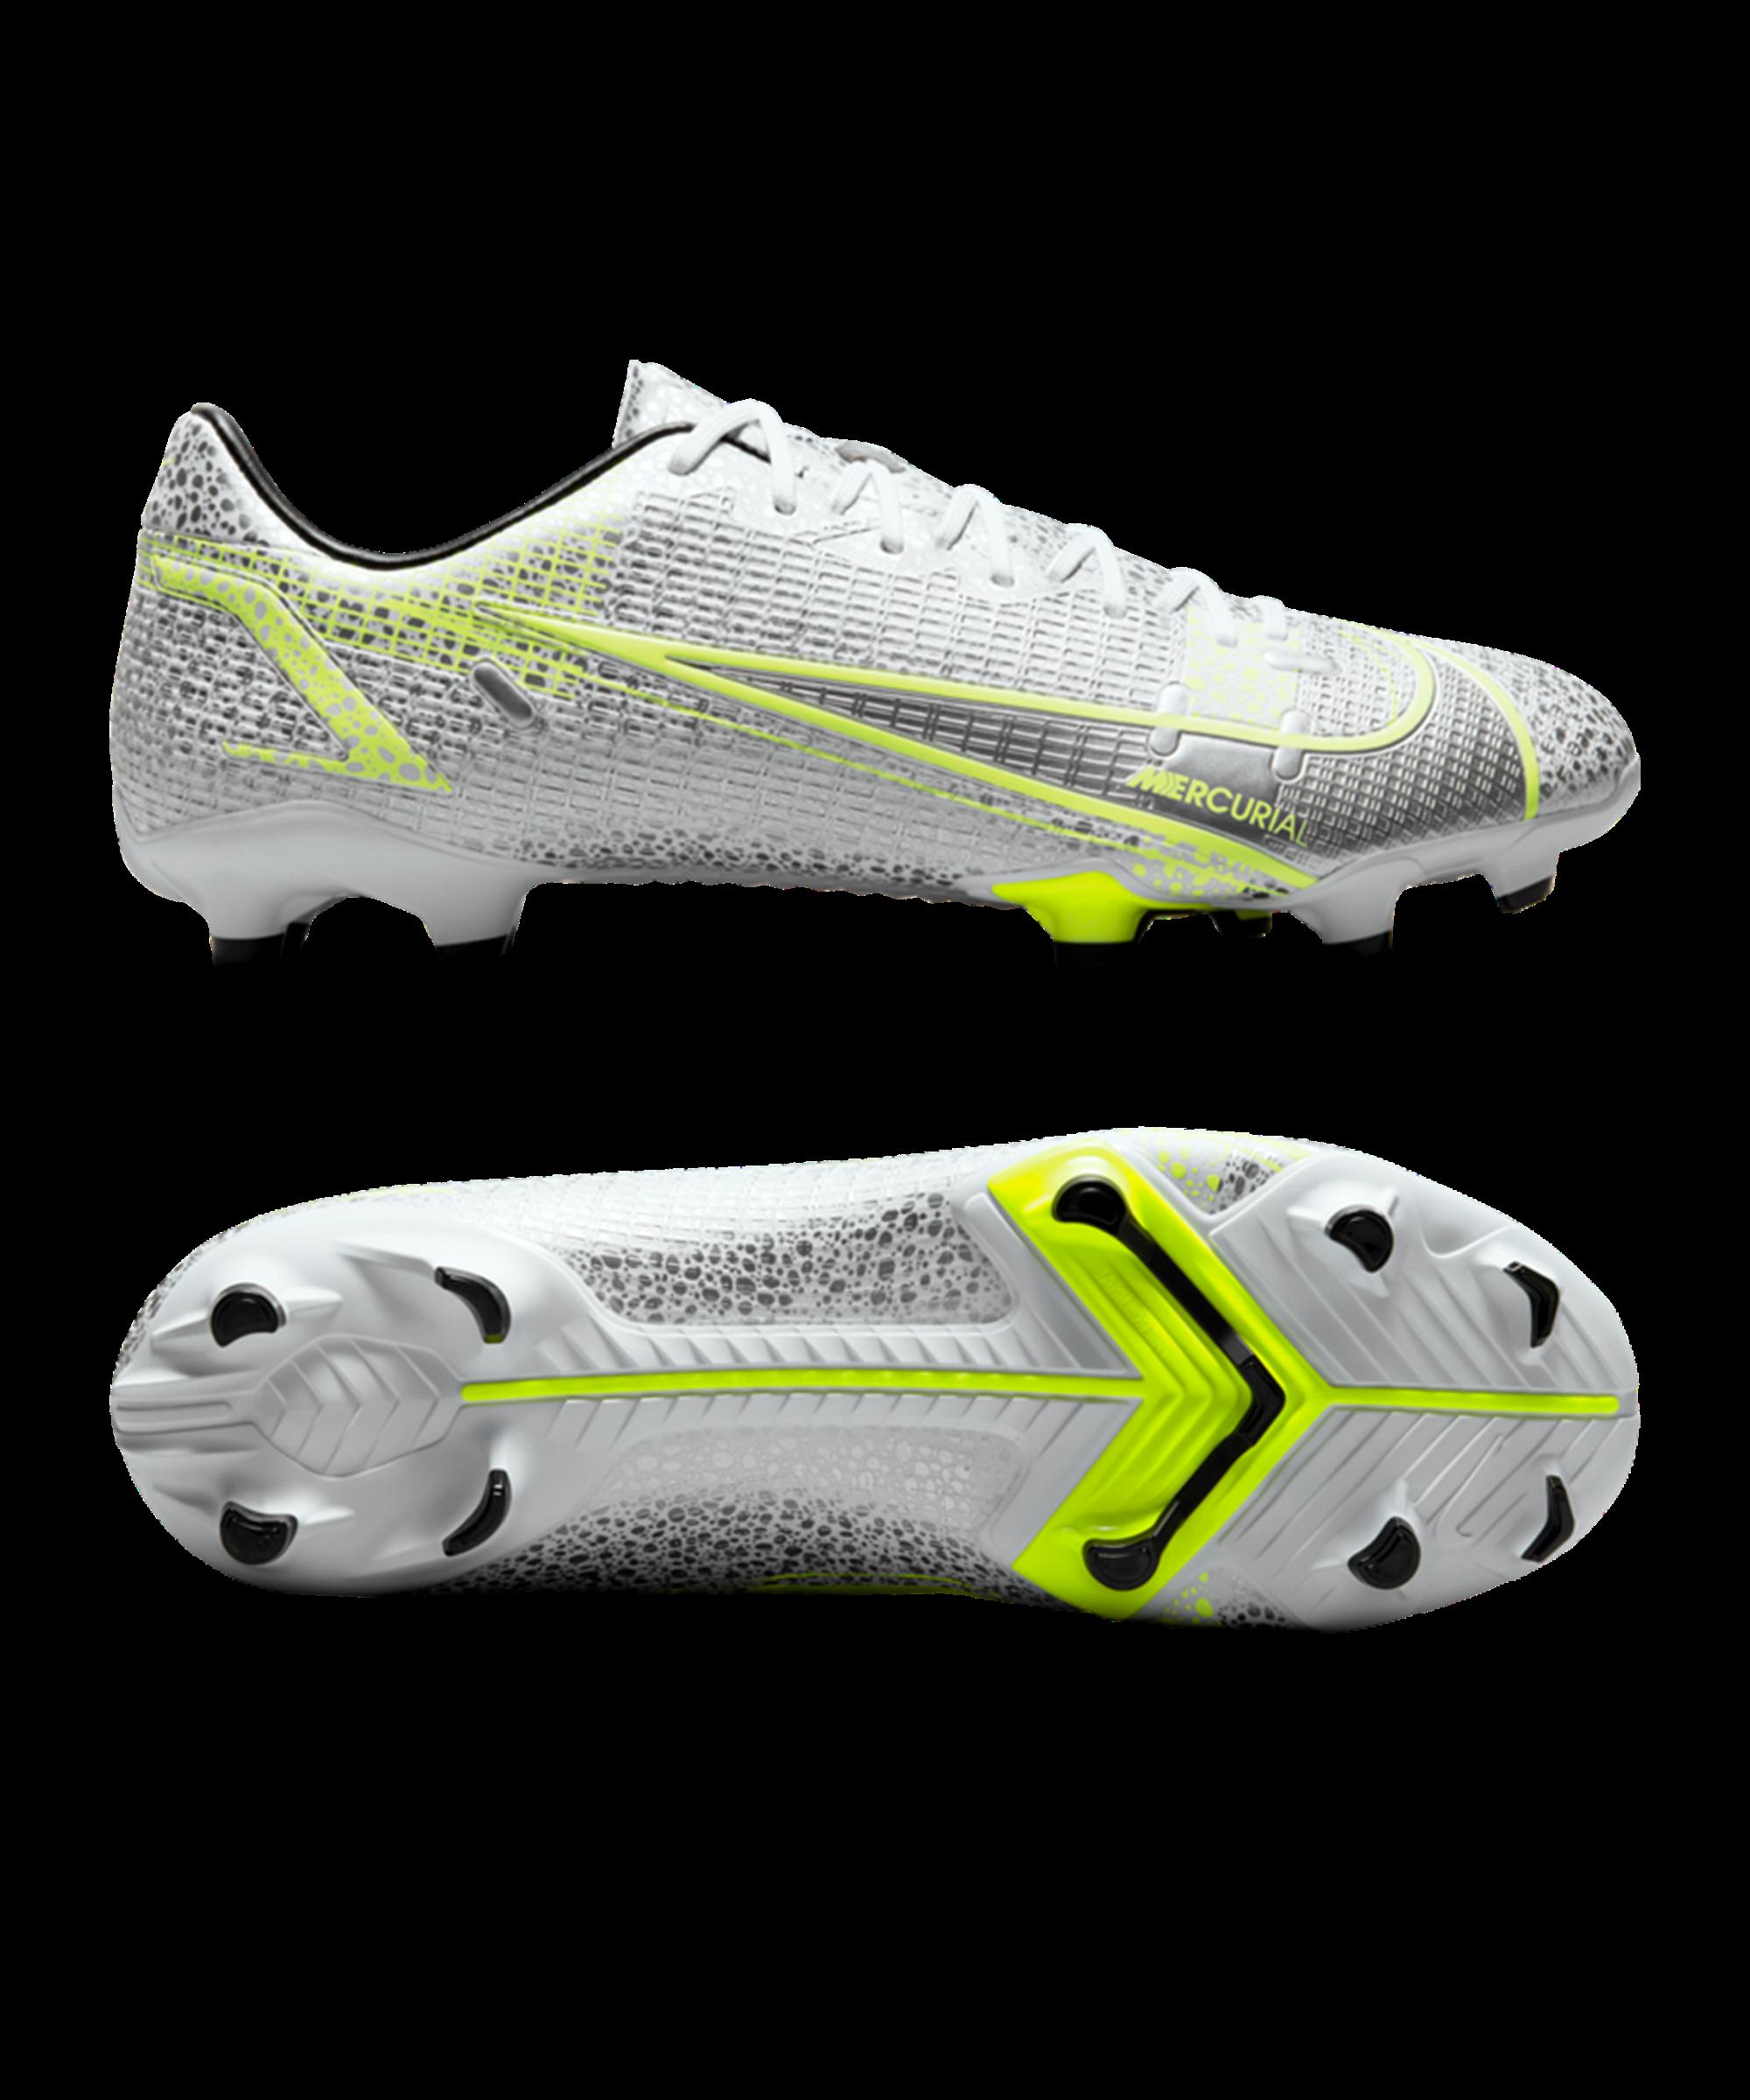 Nike Mercurial Vapor XIV Safari Academy FG/MG